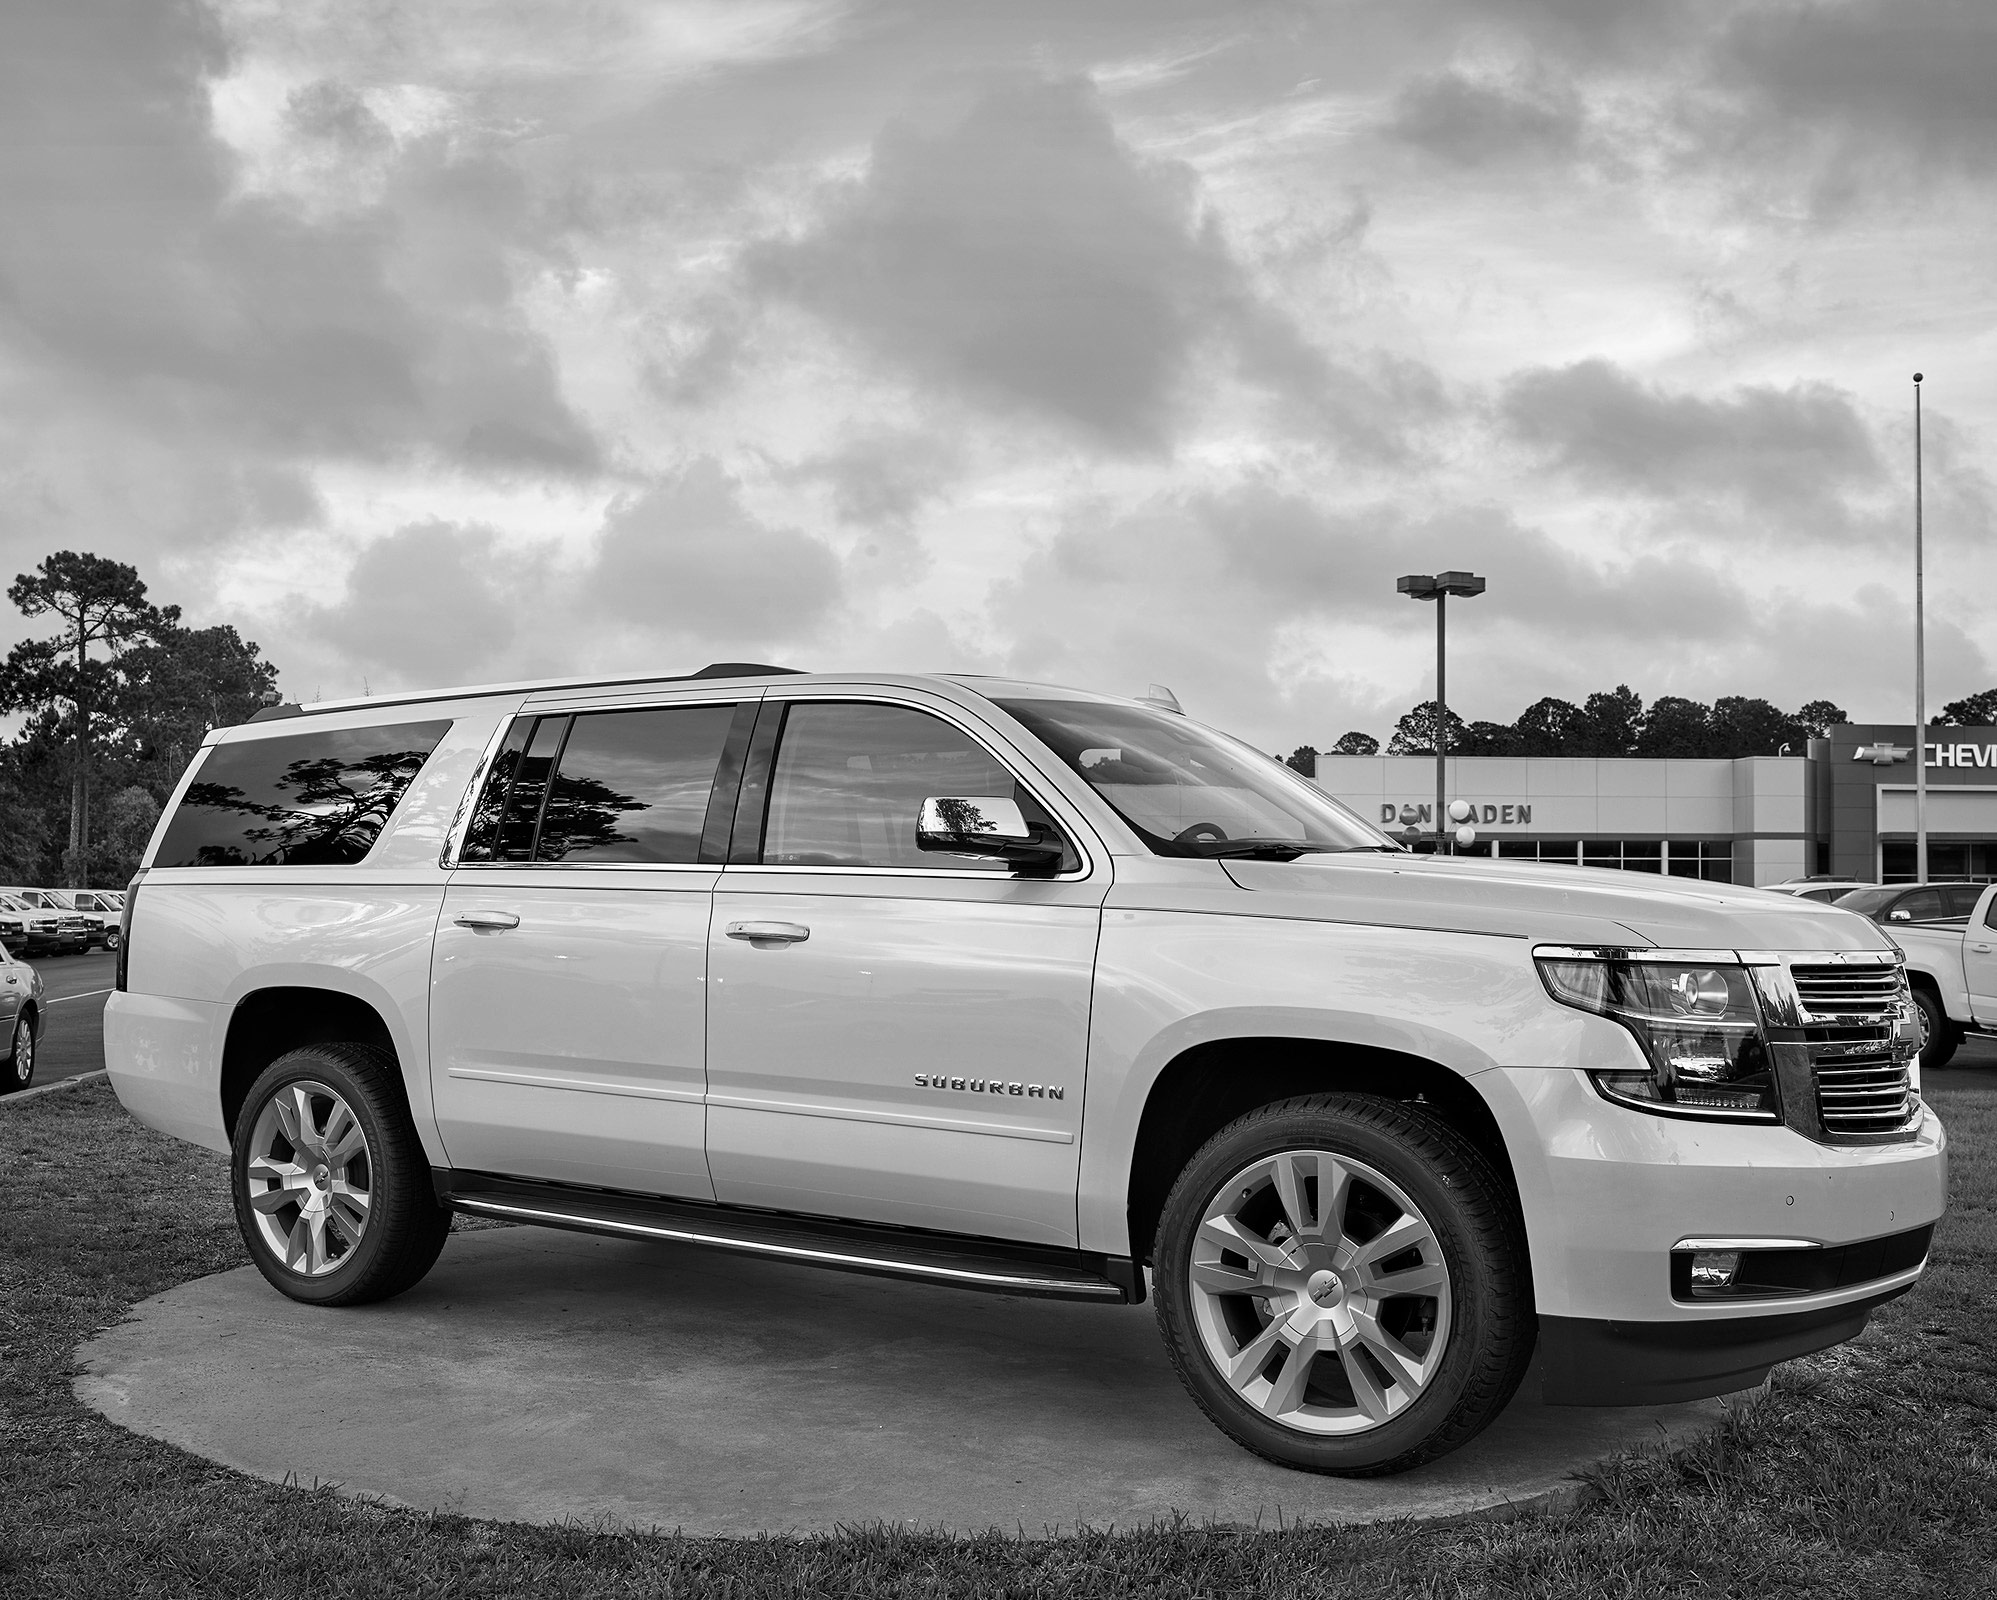 Dan Vader Chevrolet Cadillac, Brunswick, GA